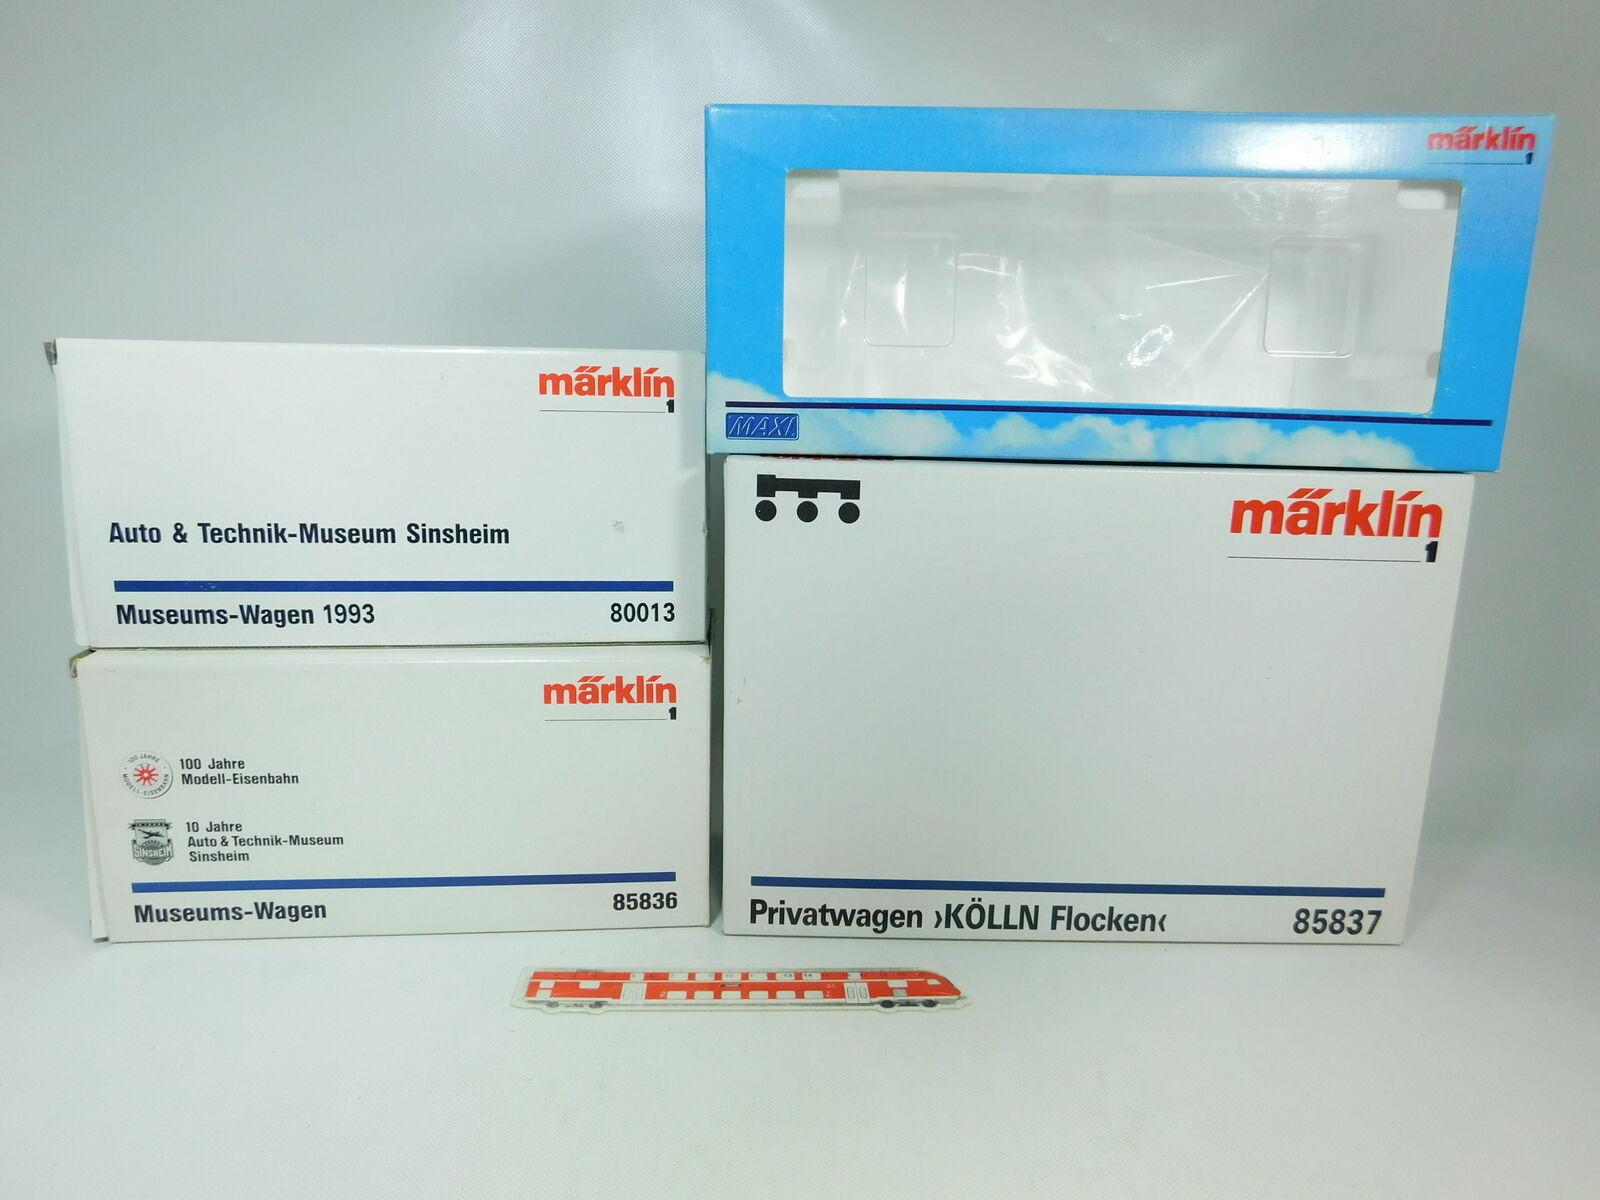 Bq224-5x Märklin pista 1 caja vacía para vagones  80013+85836+85837+95013